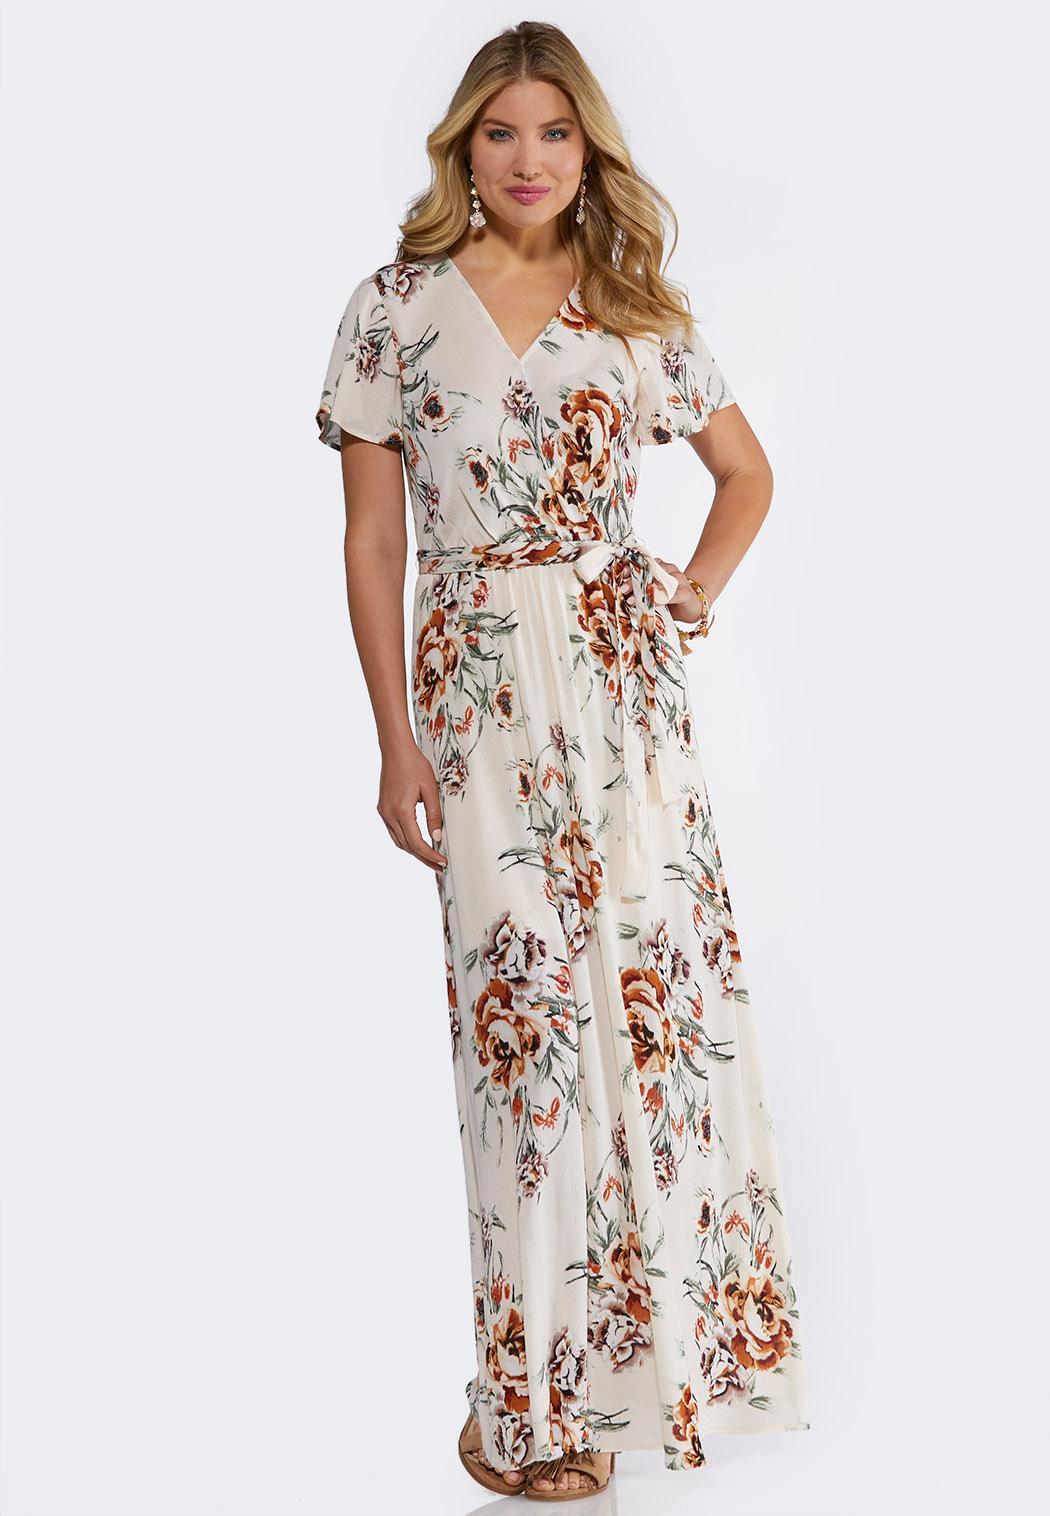 3a6b009d9b48 Plus Size Ivory Floral Maxi Dress Dresses Cato Fashions